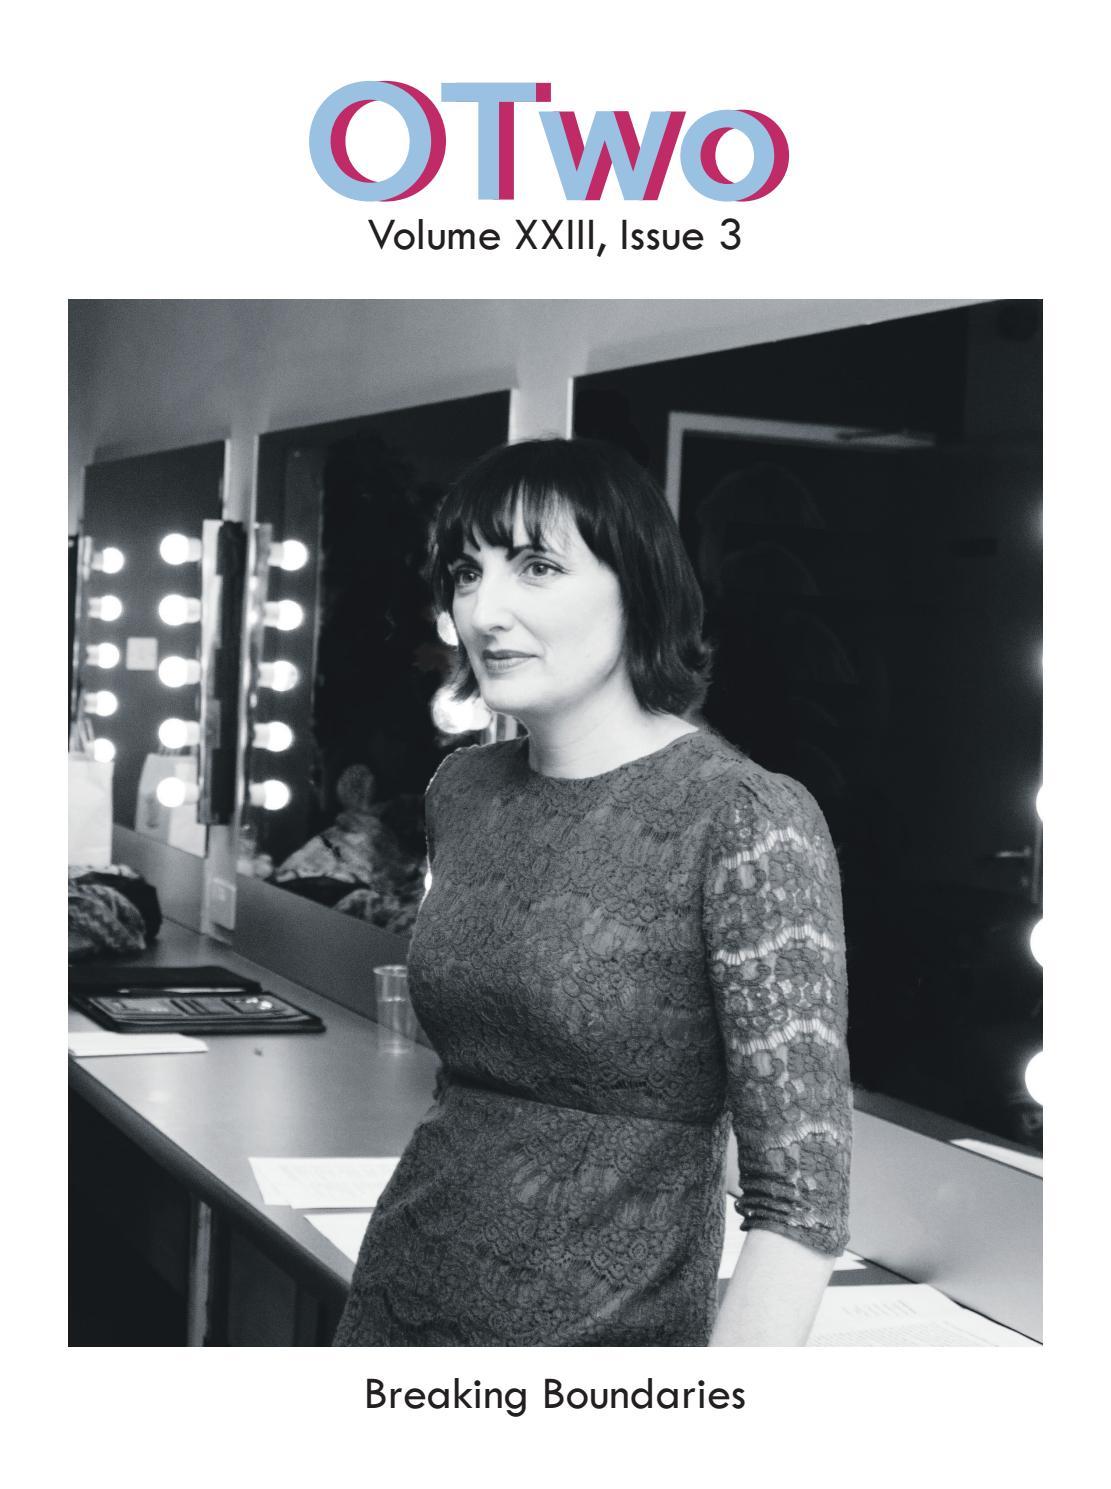 4310de621b80 Vol.XXIII - Issue 3 - OTwo by The University Observer - issuu